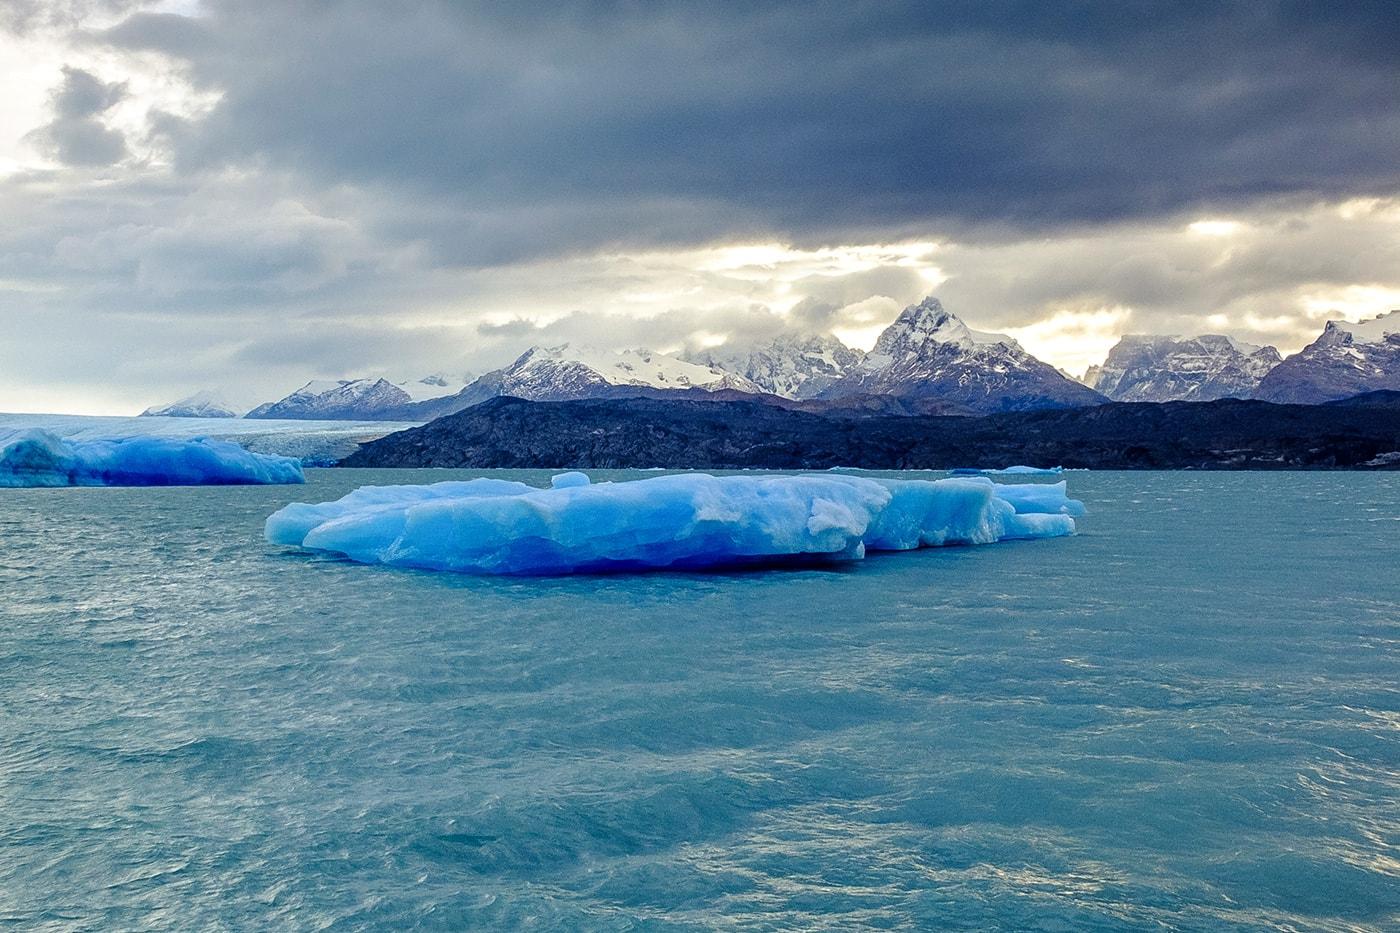 un iceberg sul lago argentino